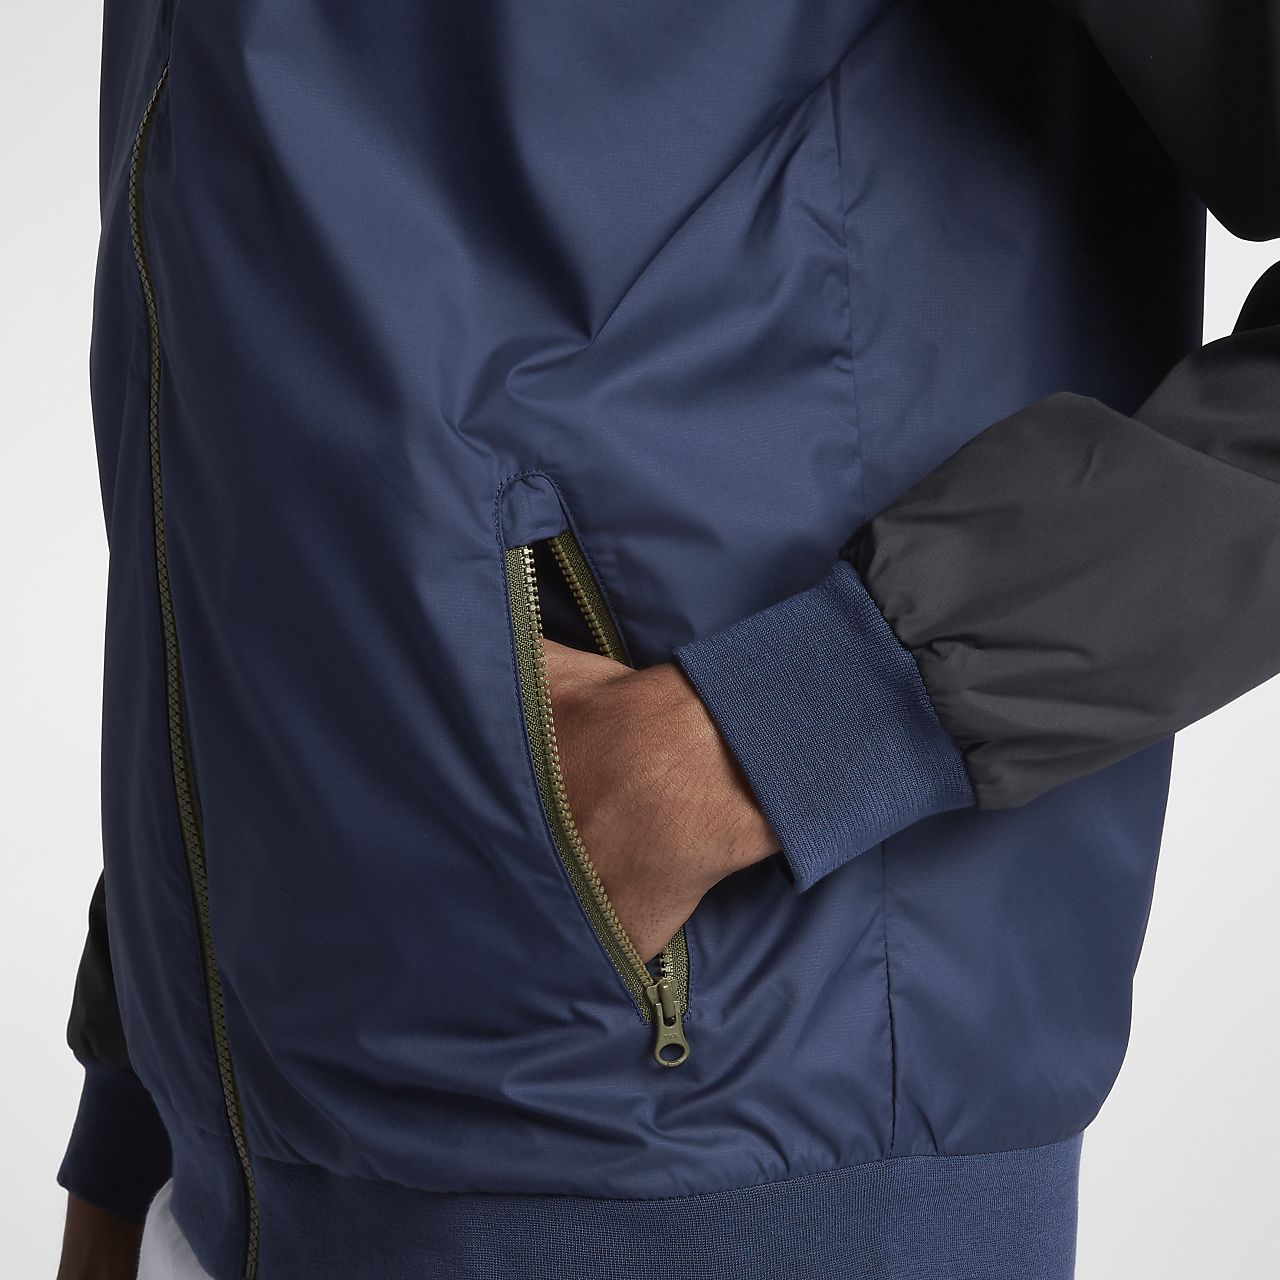 Nike USA Windrunner Jacket Mens Midnight NavyWhite